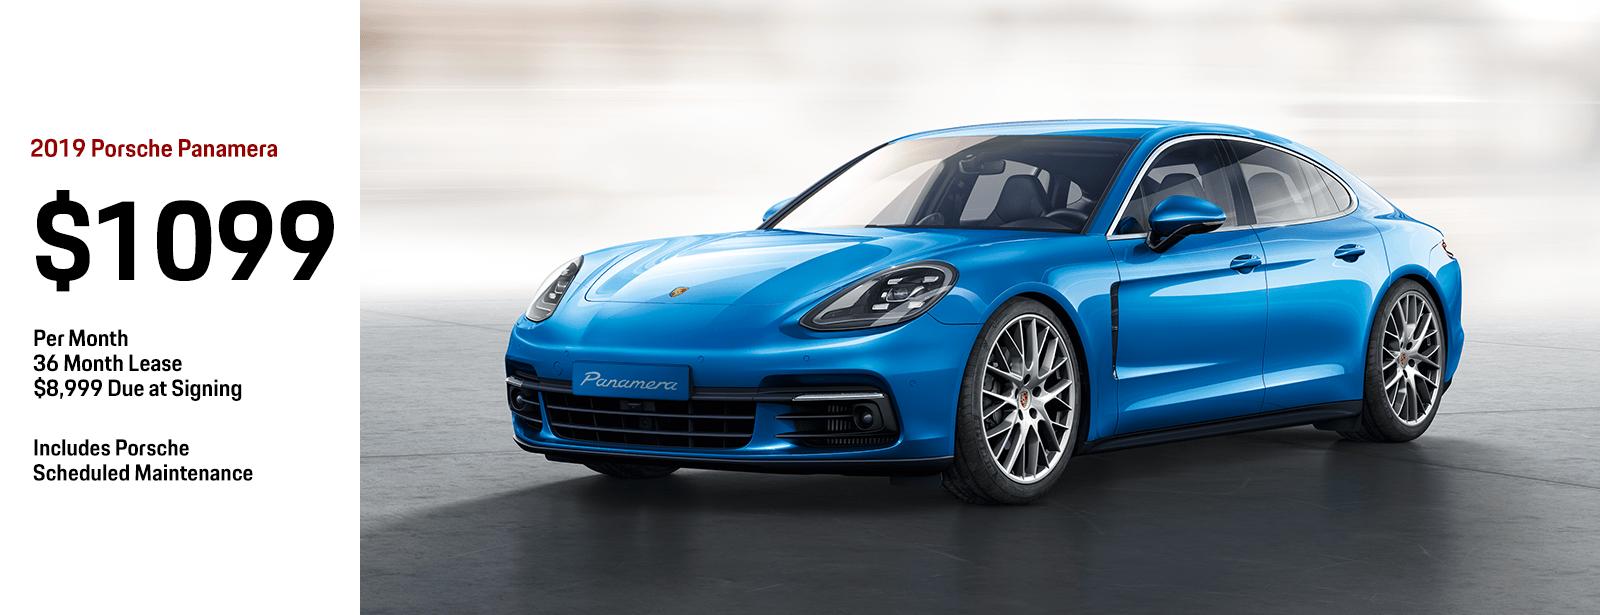 Porsche Panamera Lease >> New 2018 Porsche Panamera Special Lease Offer Chandler Az